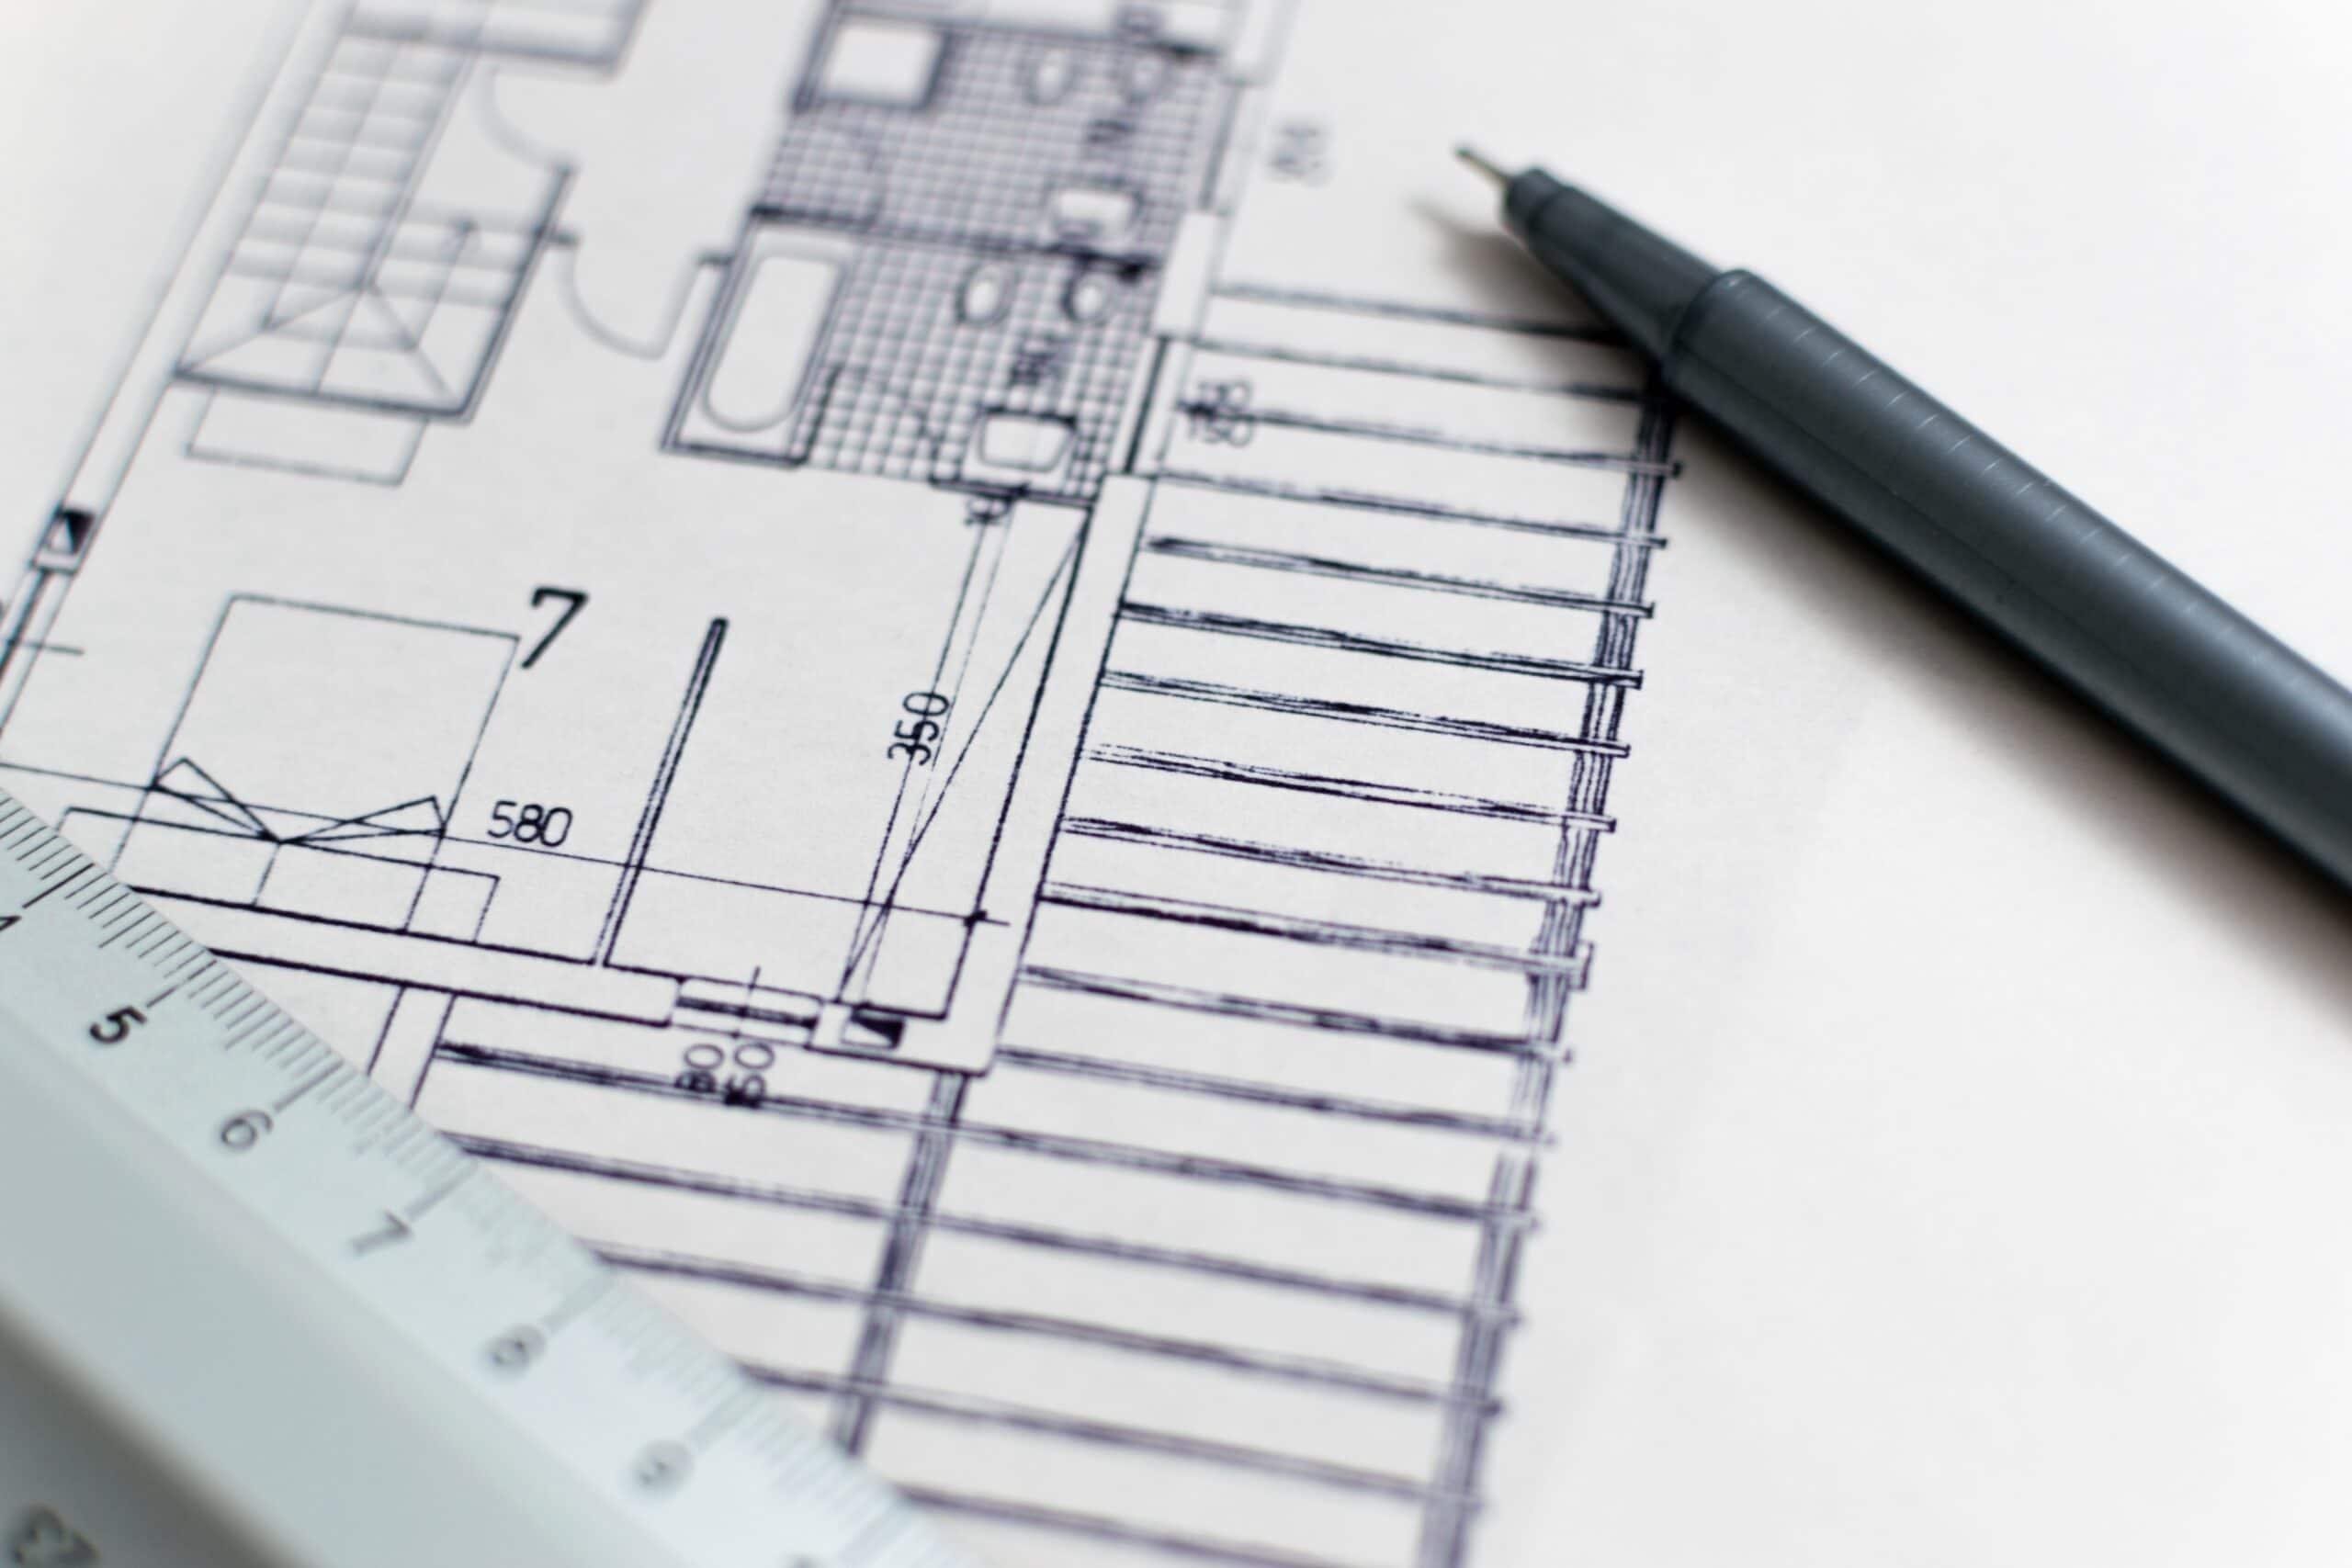 Planos de planta de AutoCAD